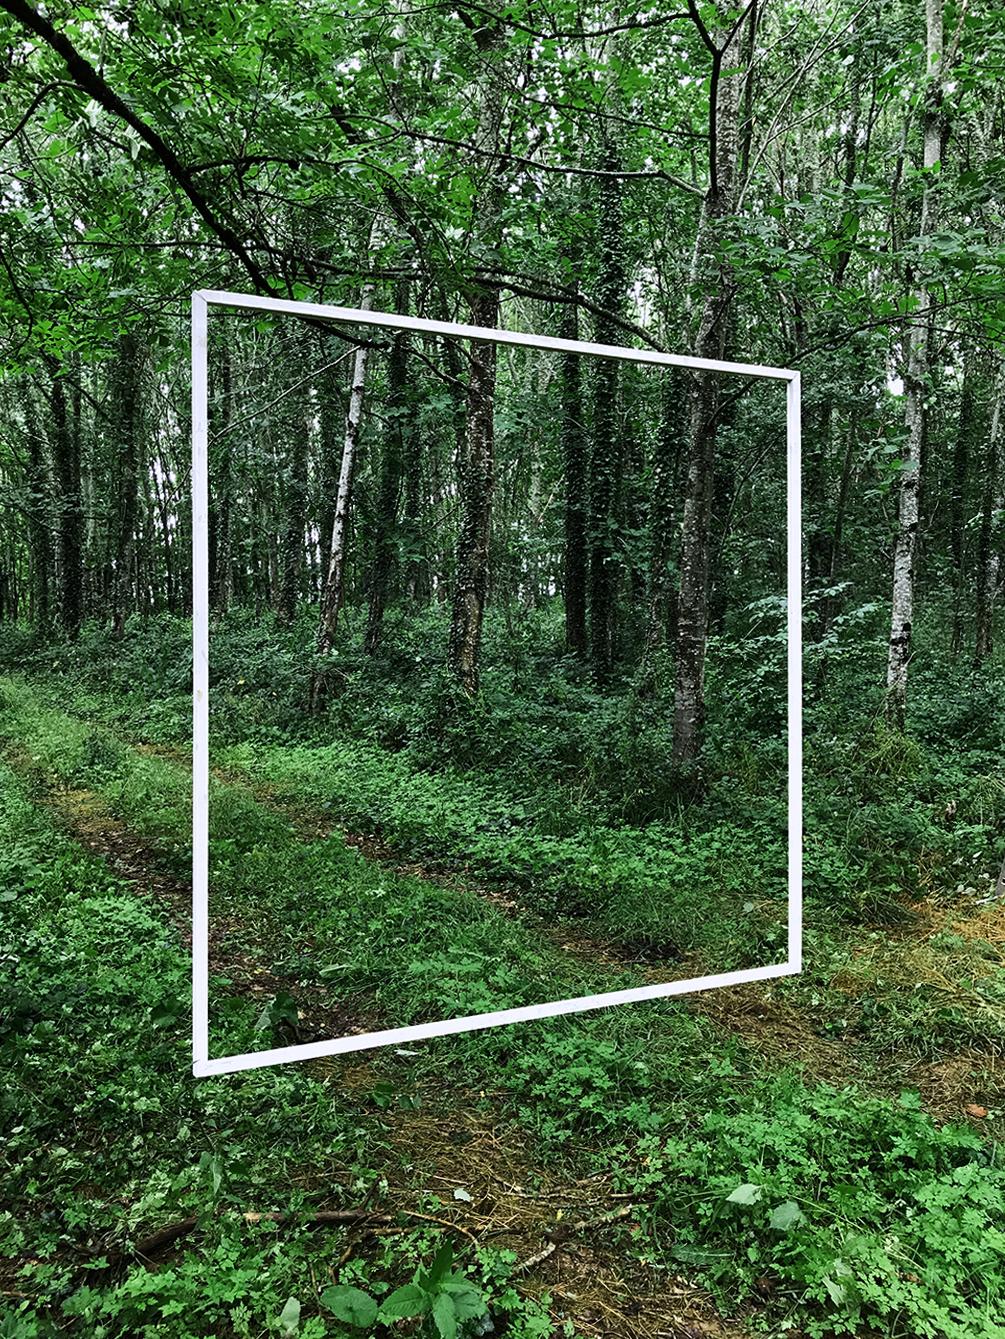 Filtering Reality © Marco Pantaleoni